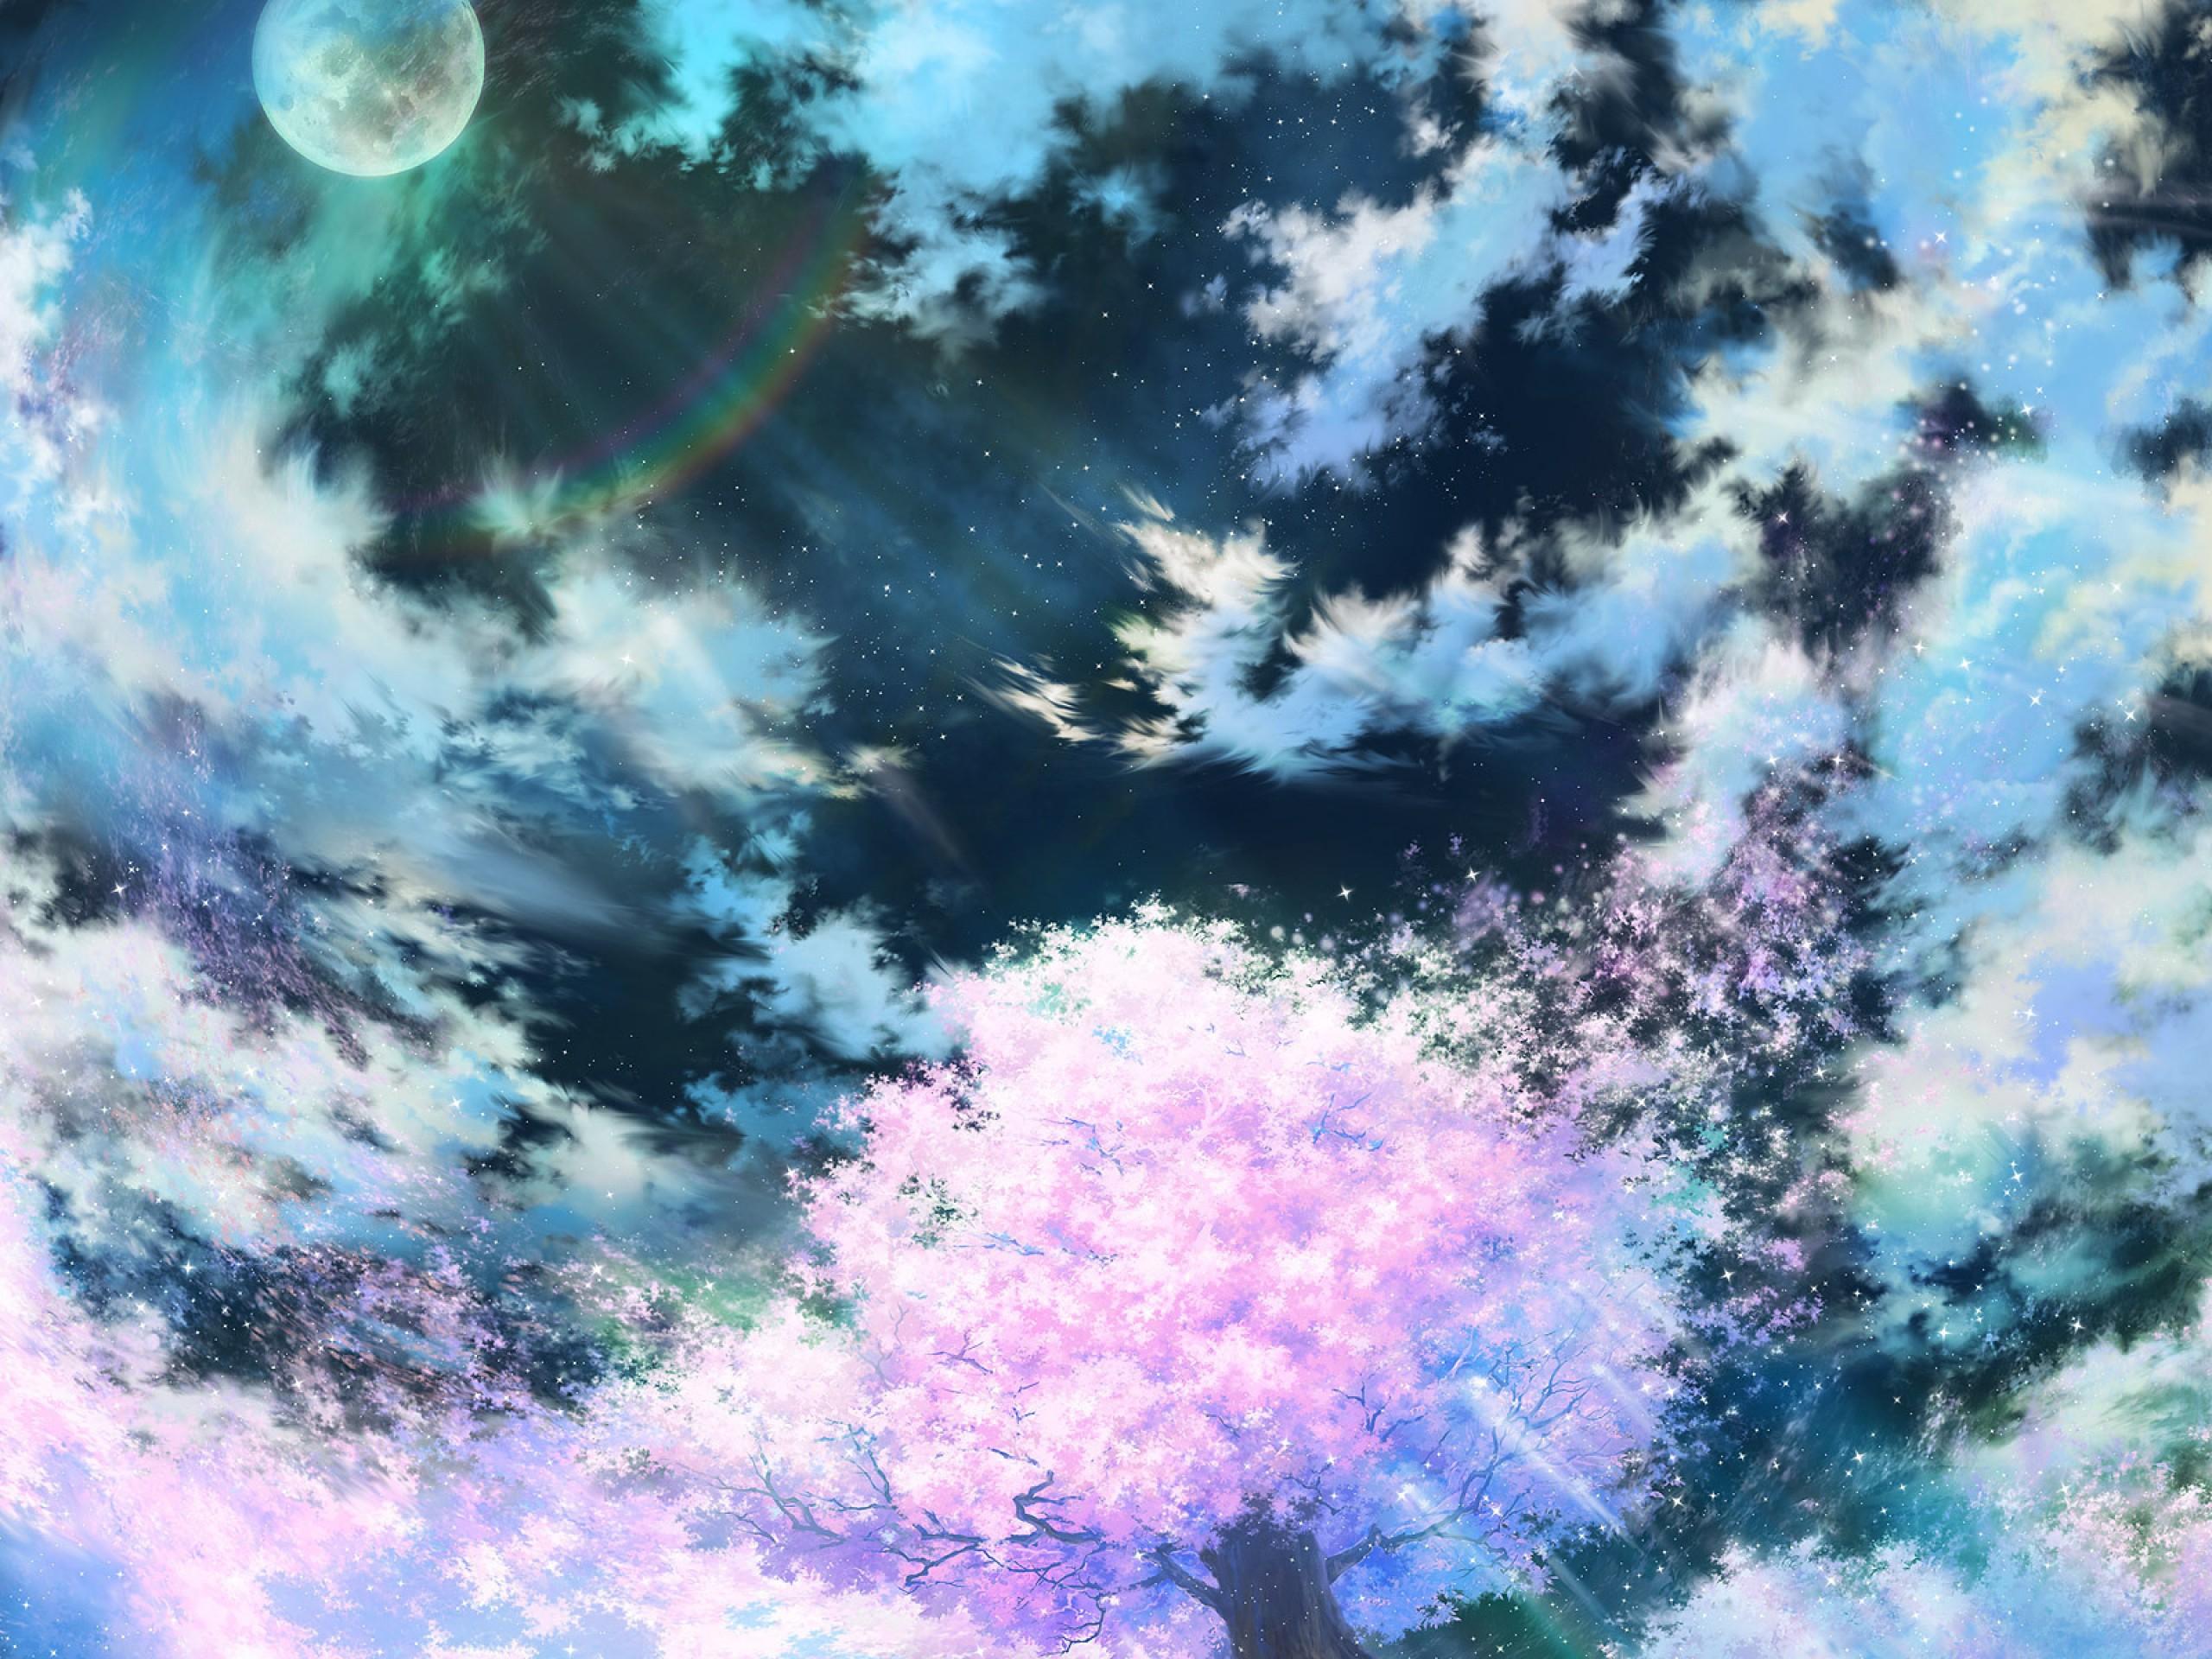 84612 Screensavers and Wallpapers Sakura for phone. Download Anime, Sakura, Sky, Art, Pink pictures for free